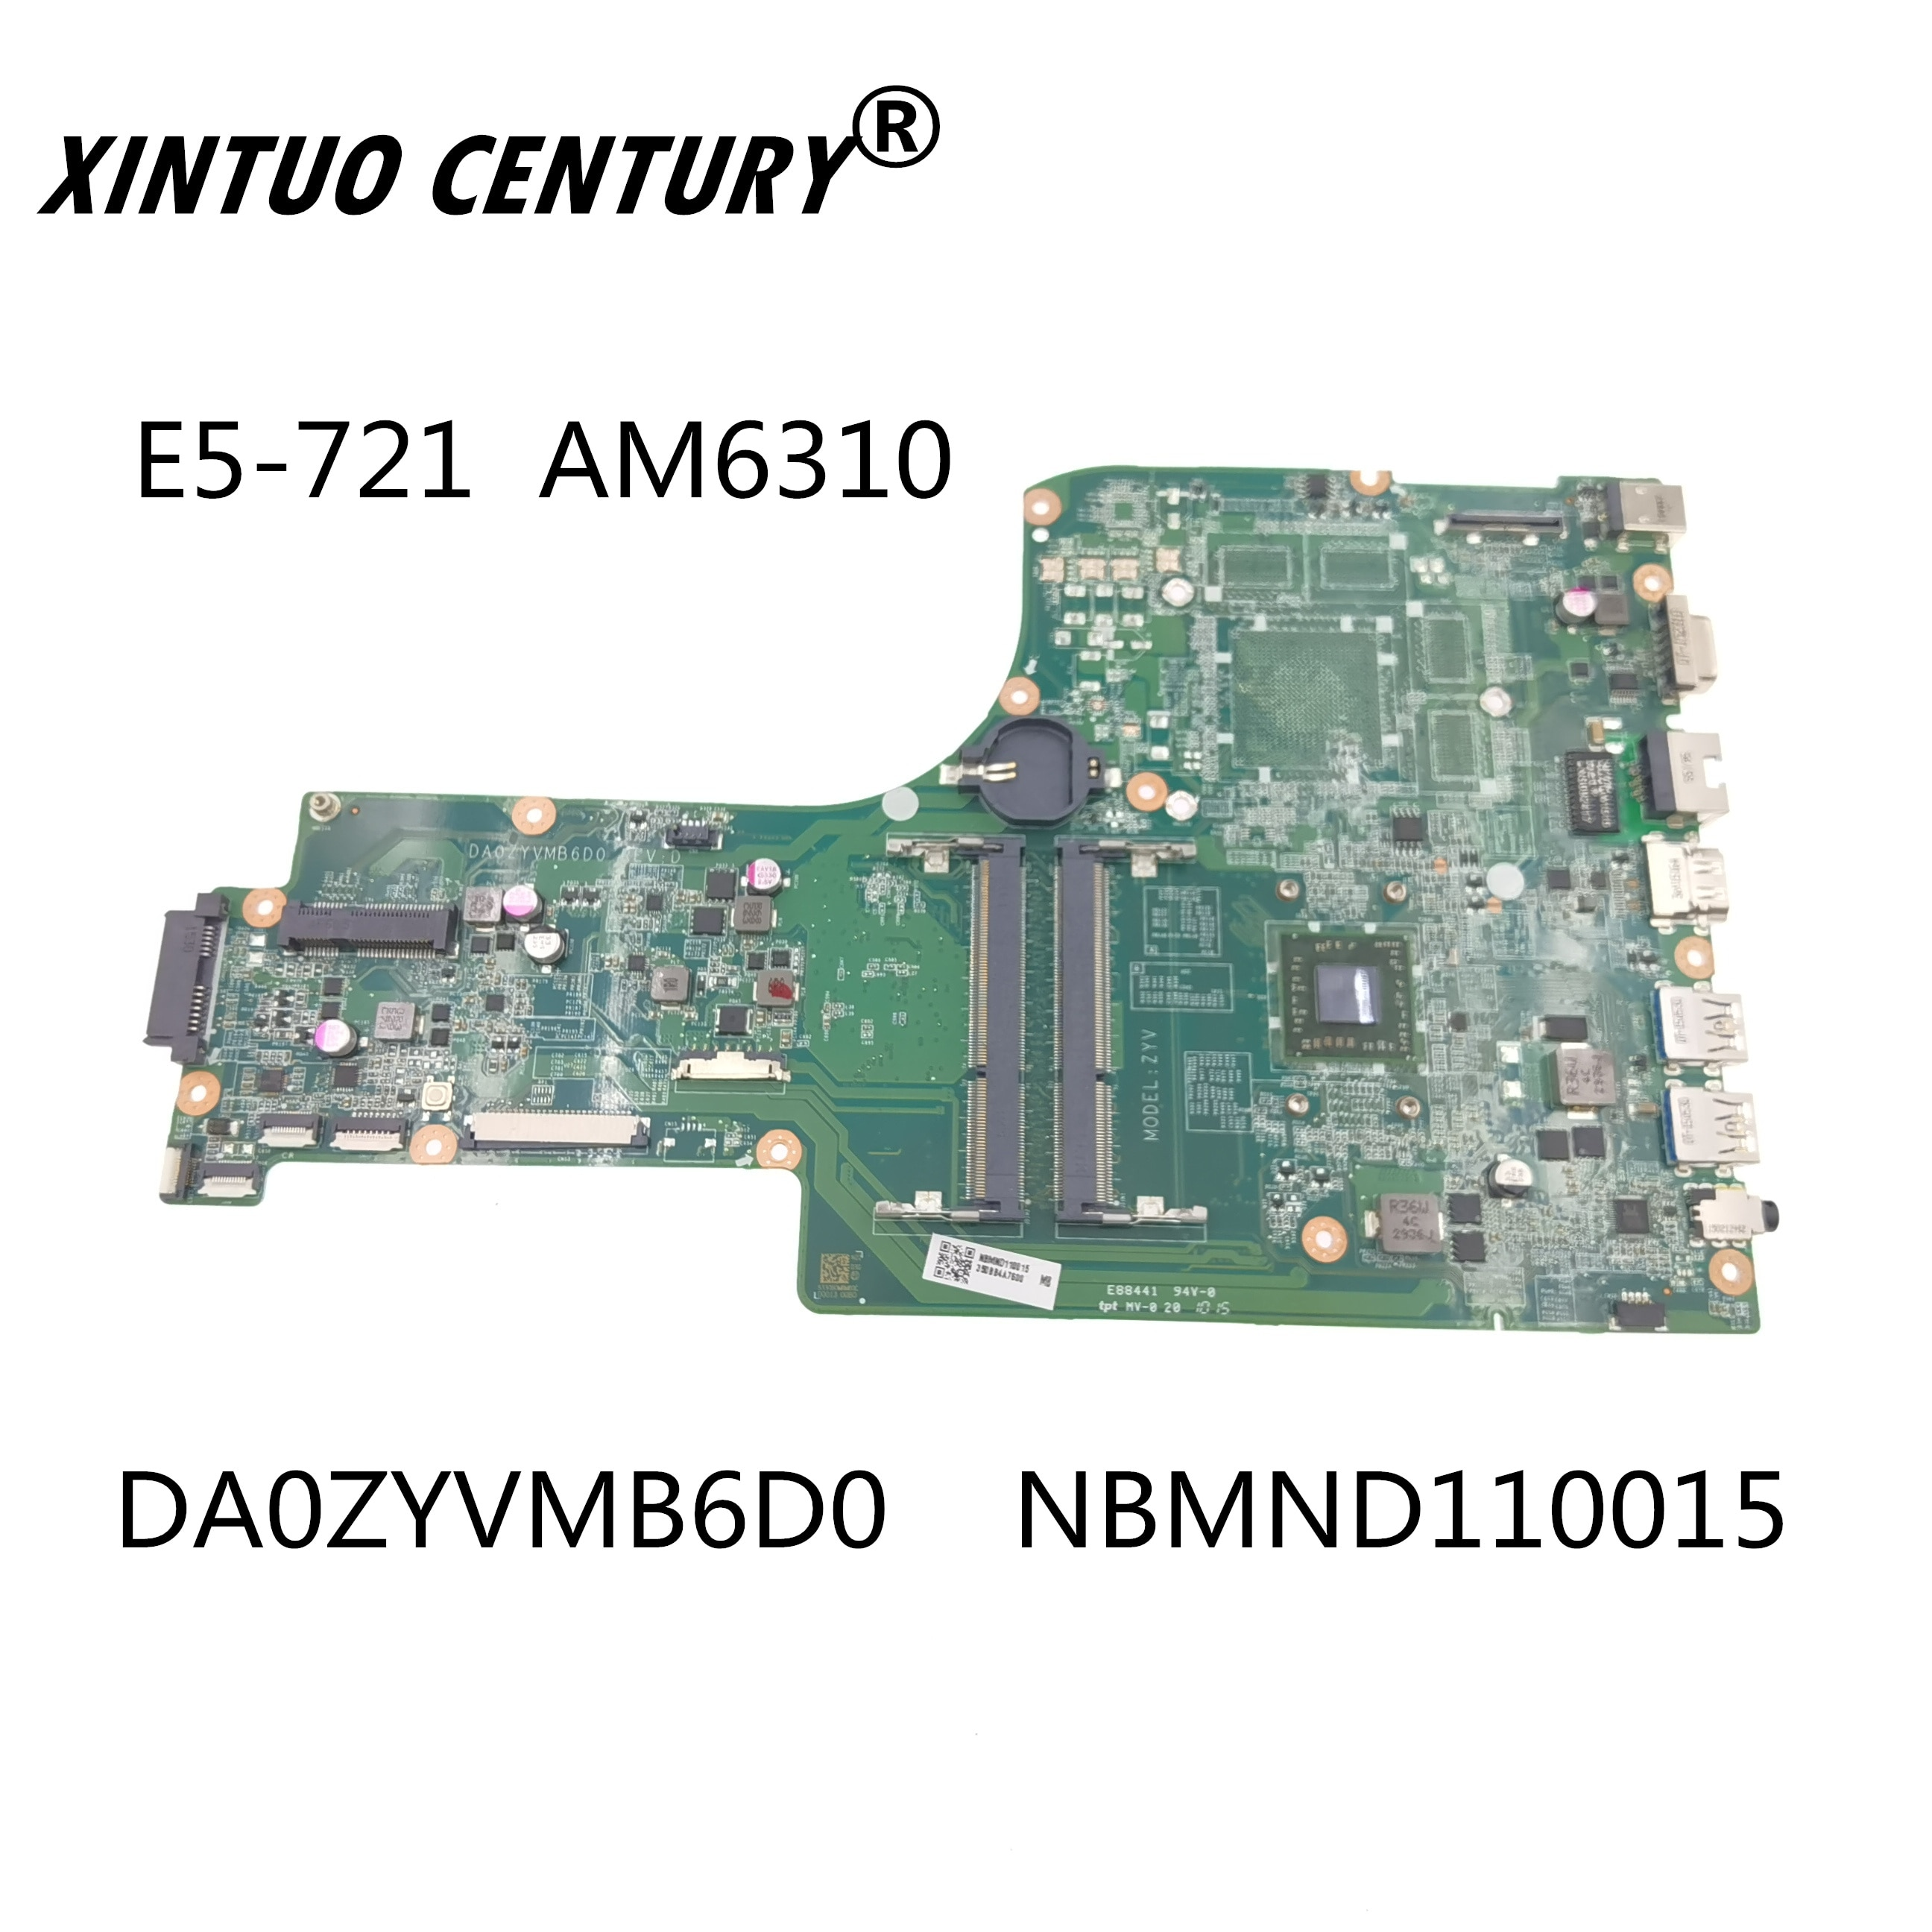 DA0ZYVMB6D0 NBMND110015 لشركة أيسر أسباير E5-721 كوانتا اللوحة المحمول NB.MND11.001 AM6310 DDR3 اختبار